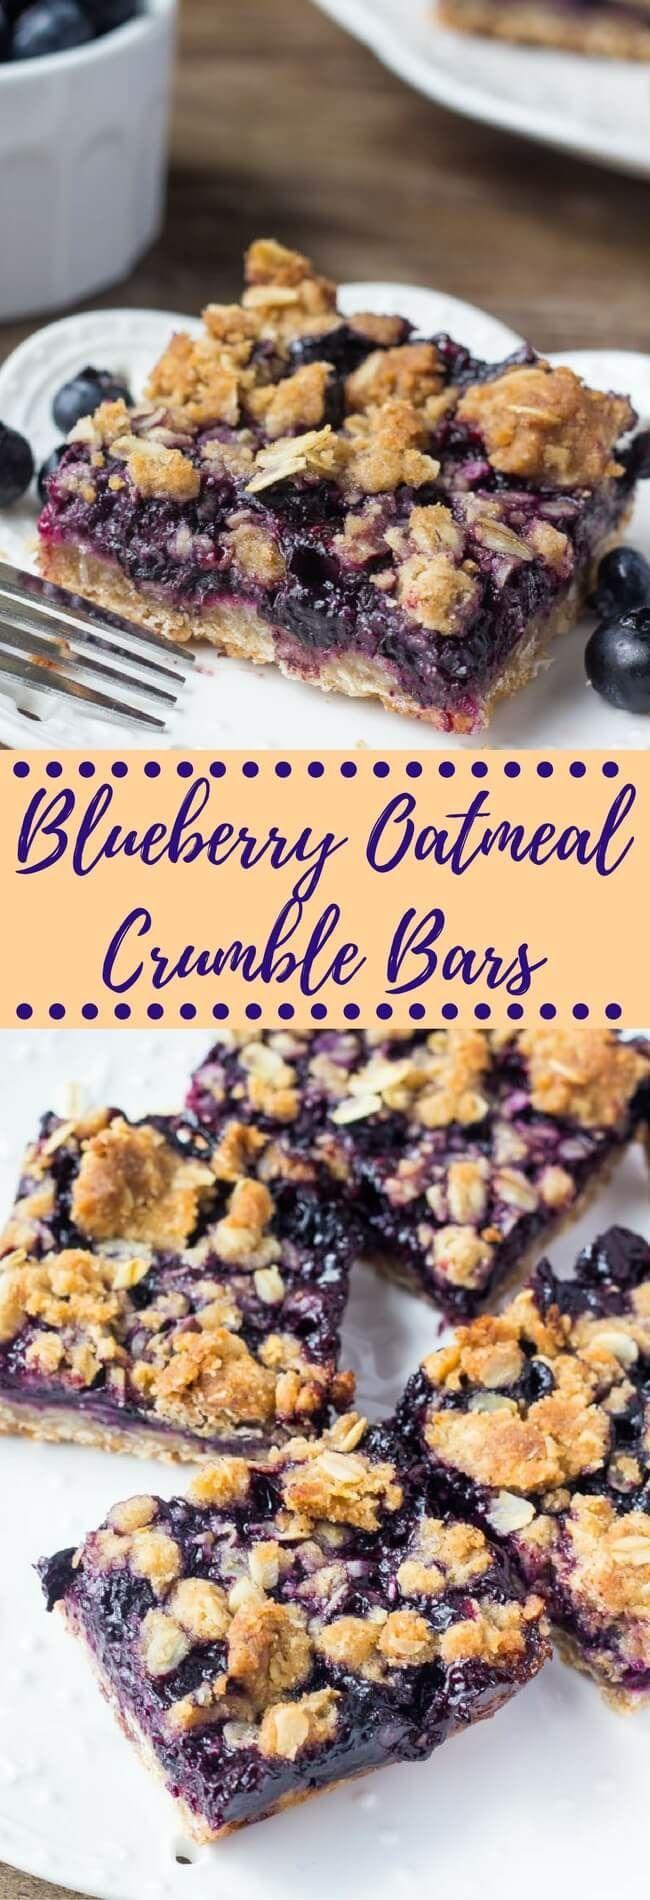 #blueberries #blueberry #breakfast #delicious #bur…